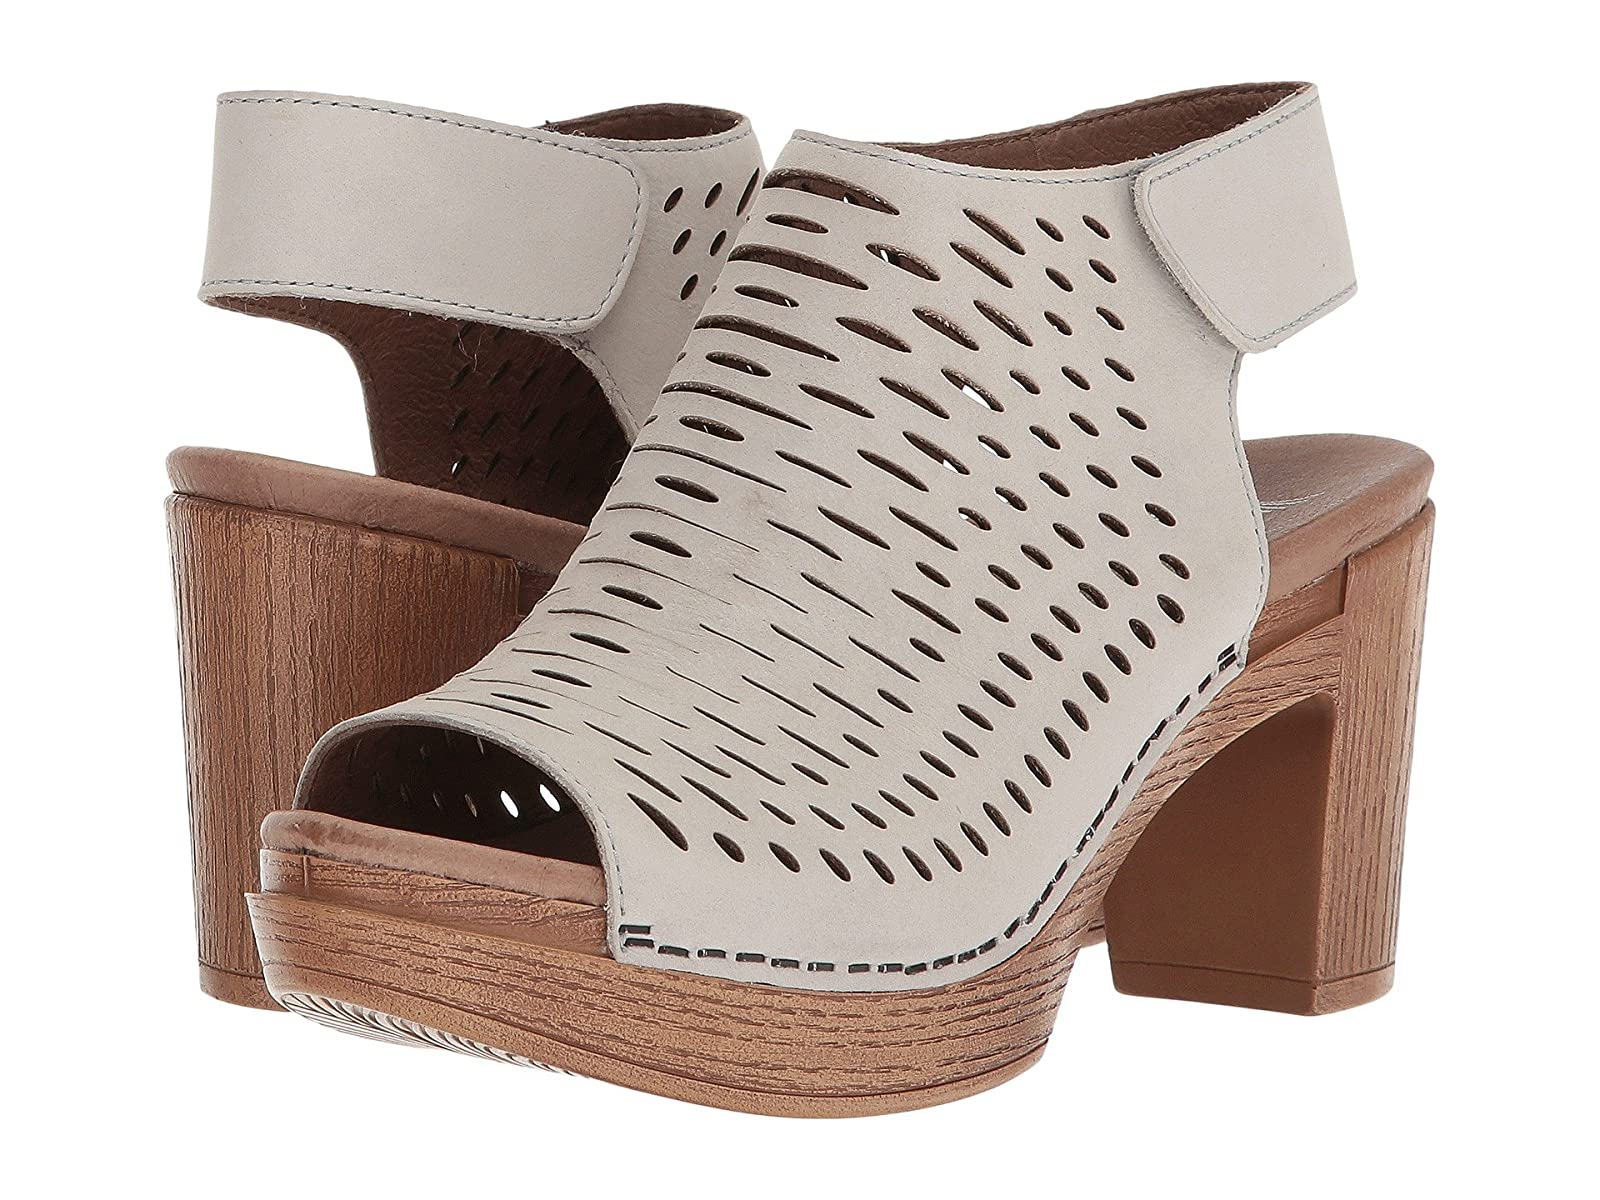 Dansko DanaeCheap and distinctive eye-catching shoes